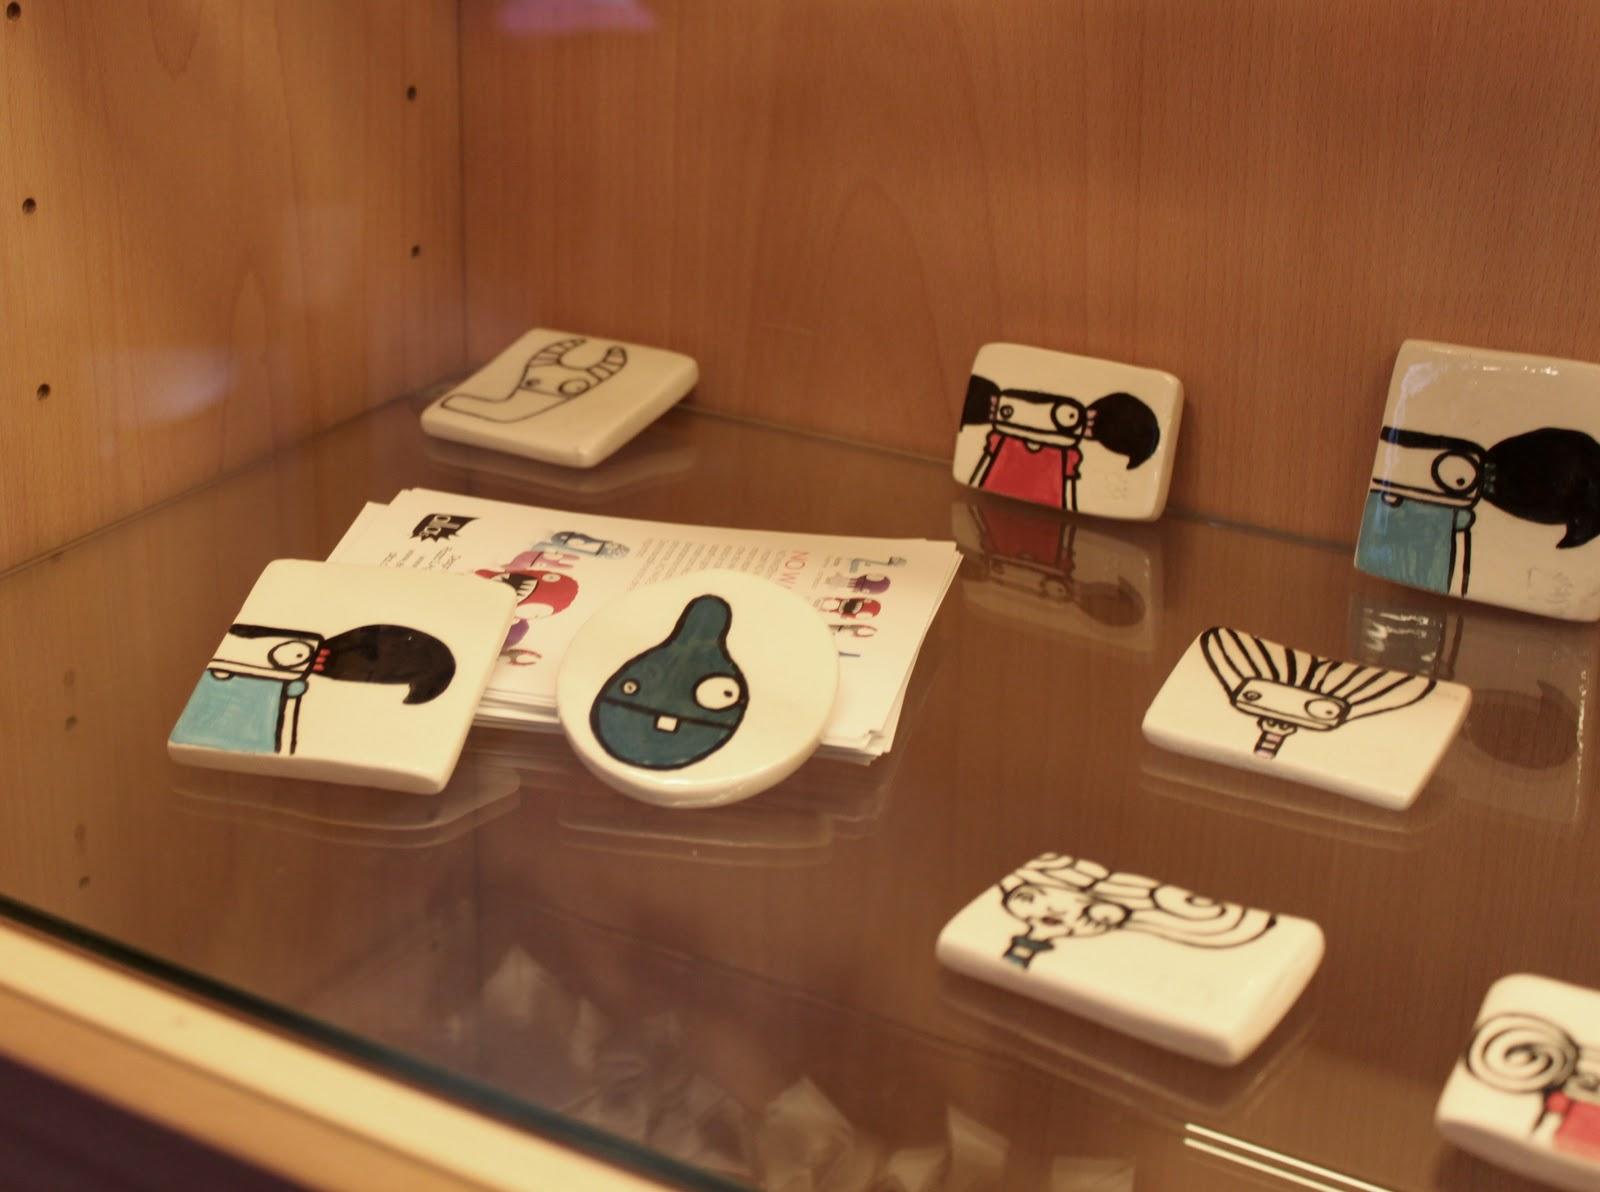 Elena salmistraro magneti e spille in ceramica e jacroki for Oggettistica moderna